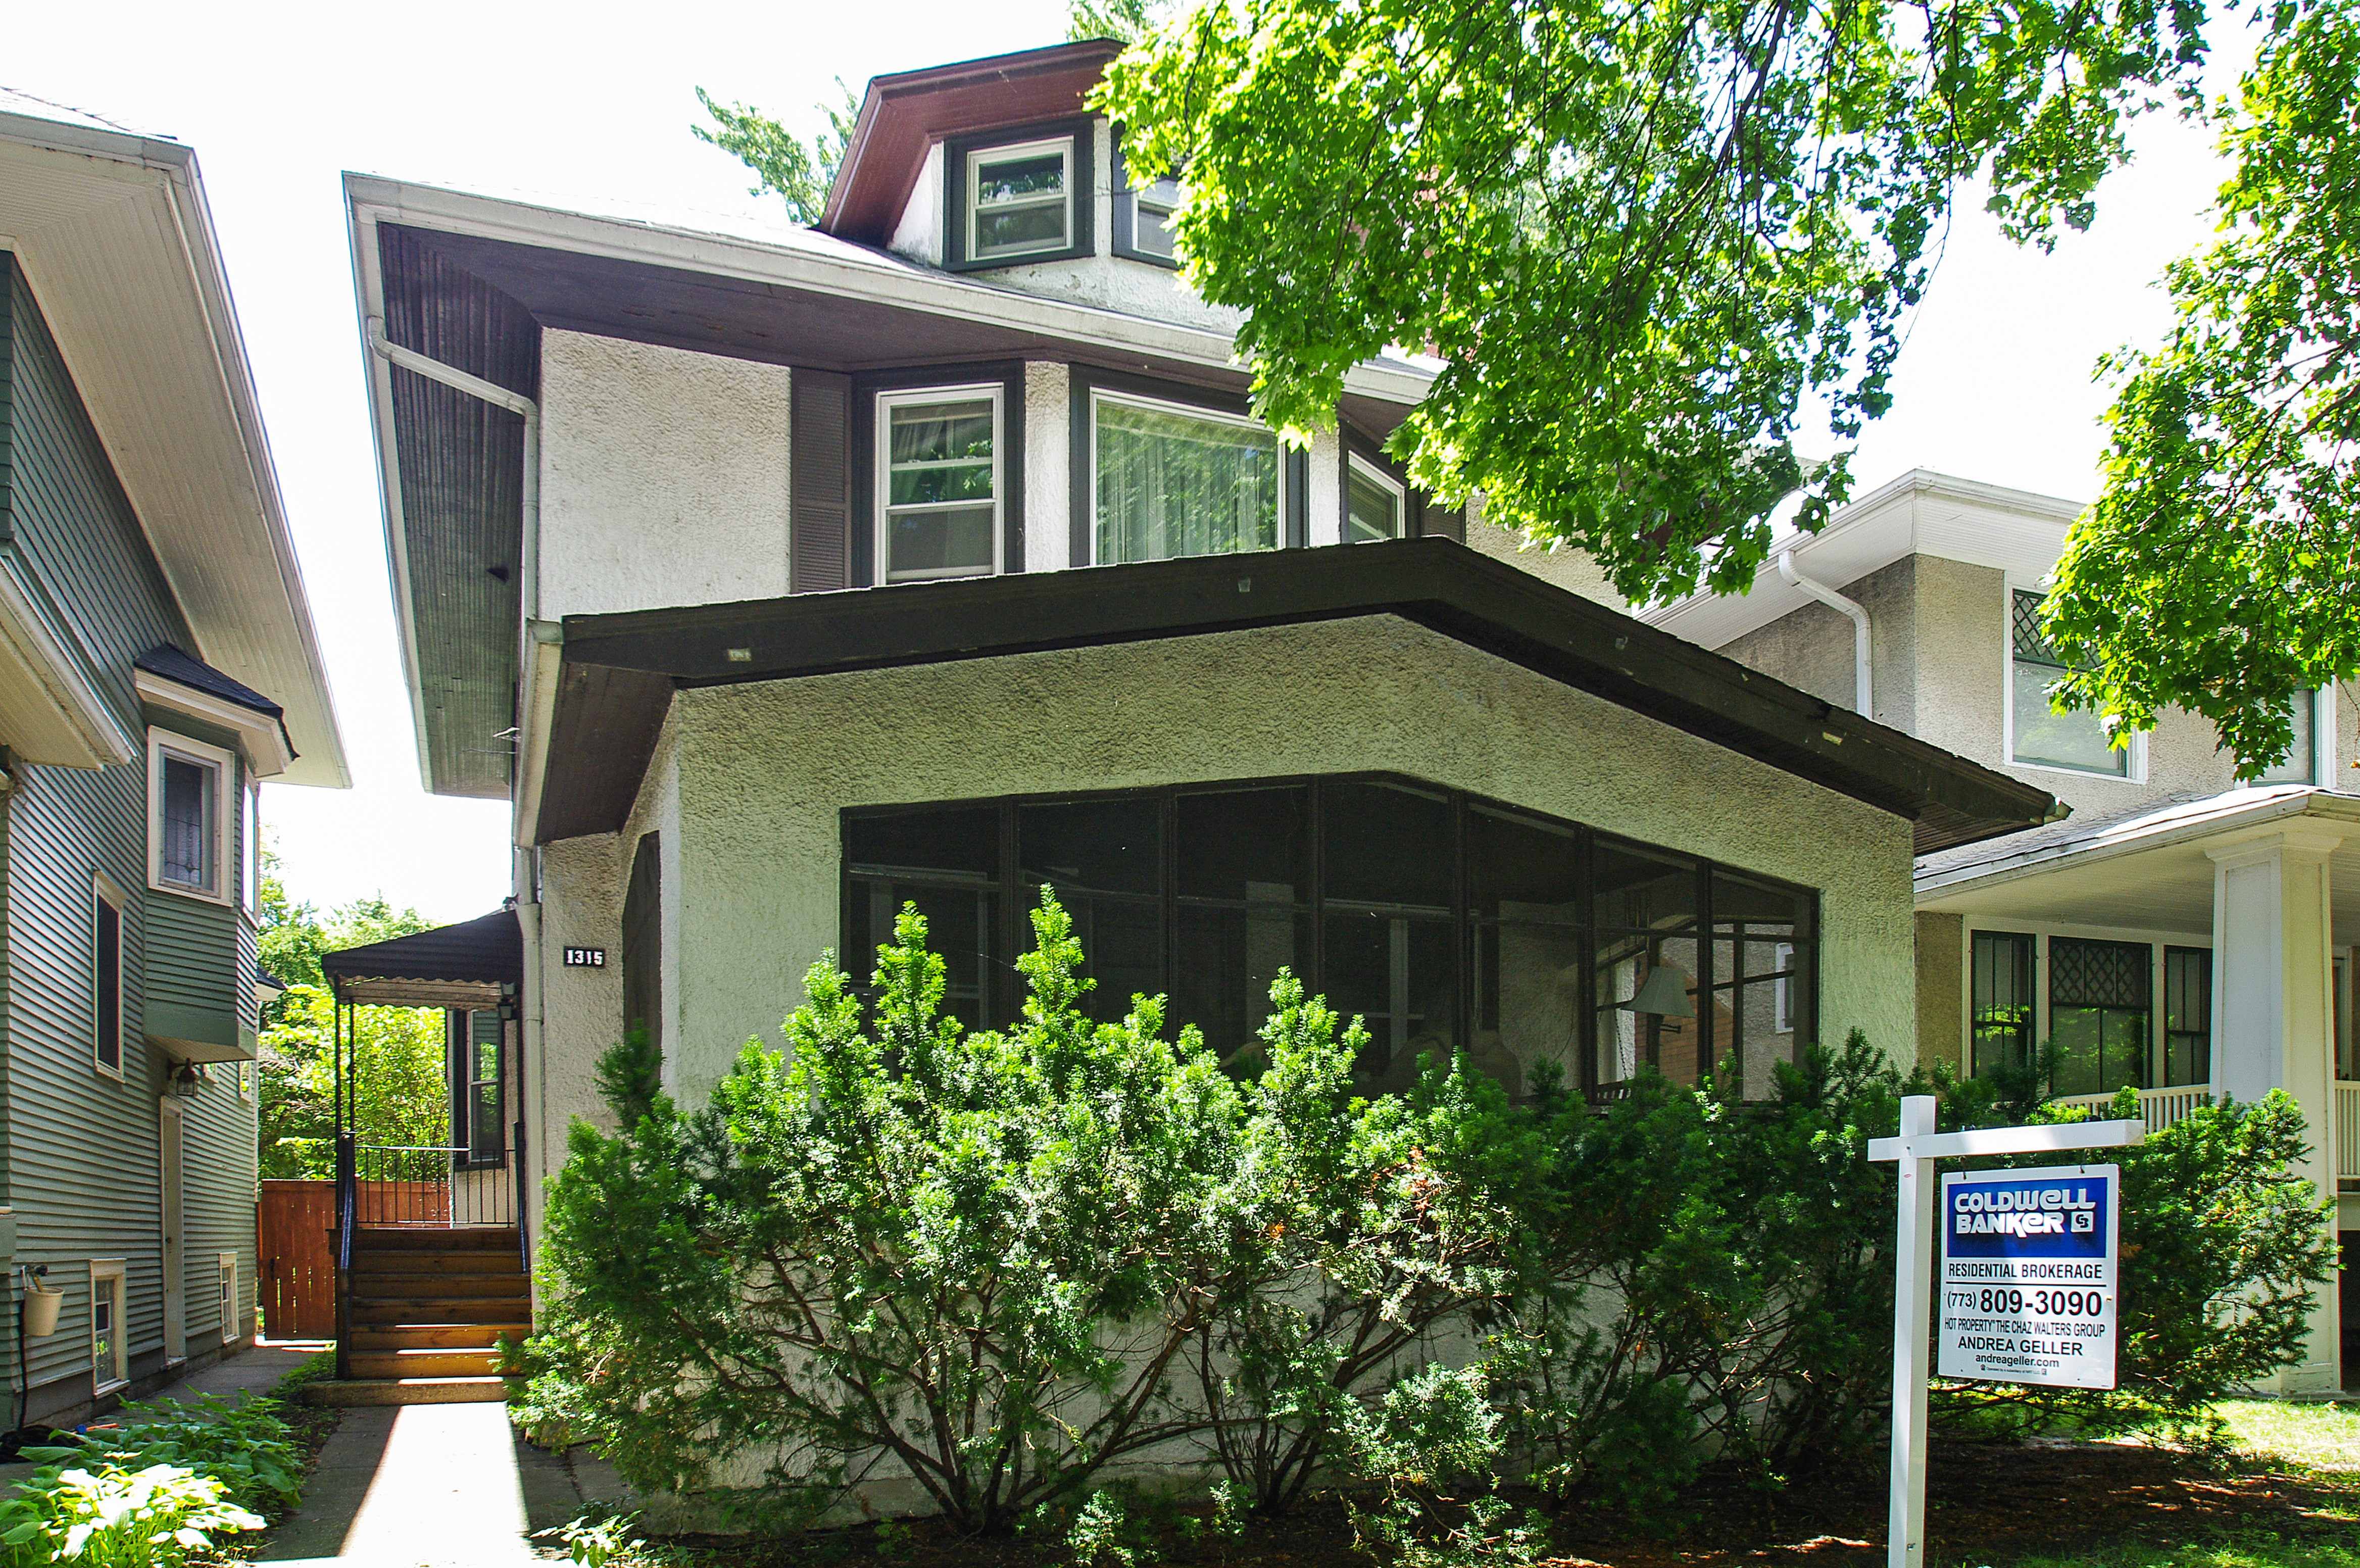 Sold Home In Edgewater Glen